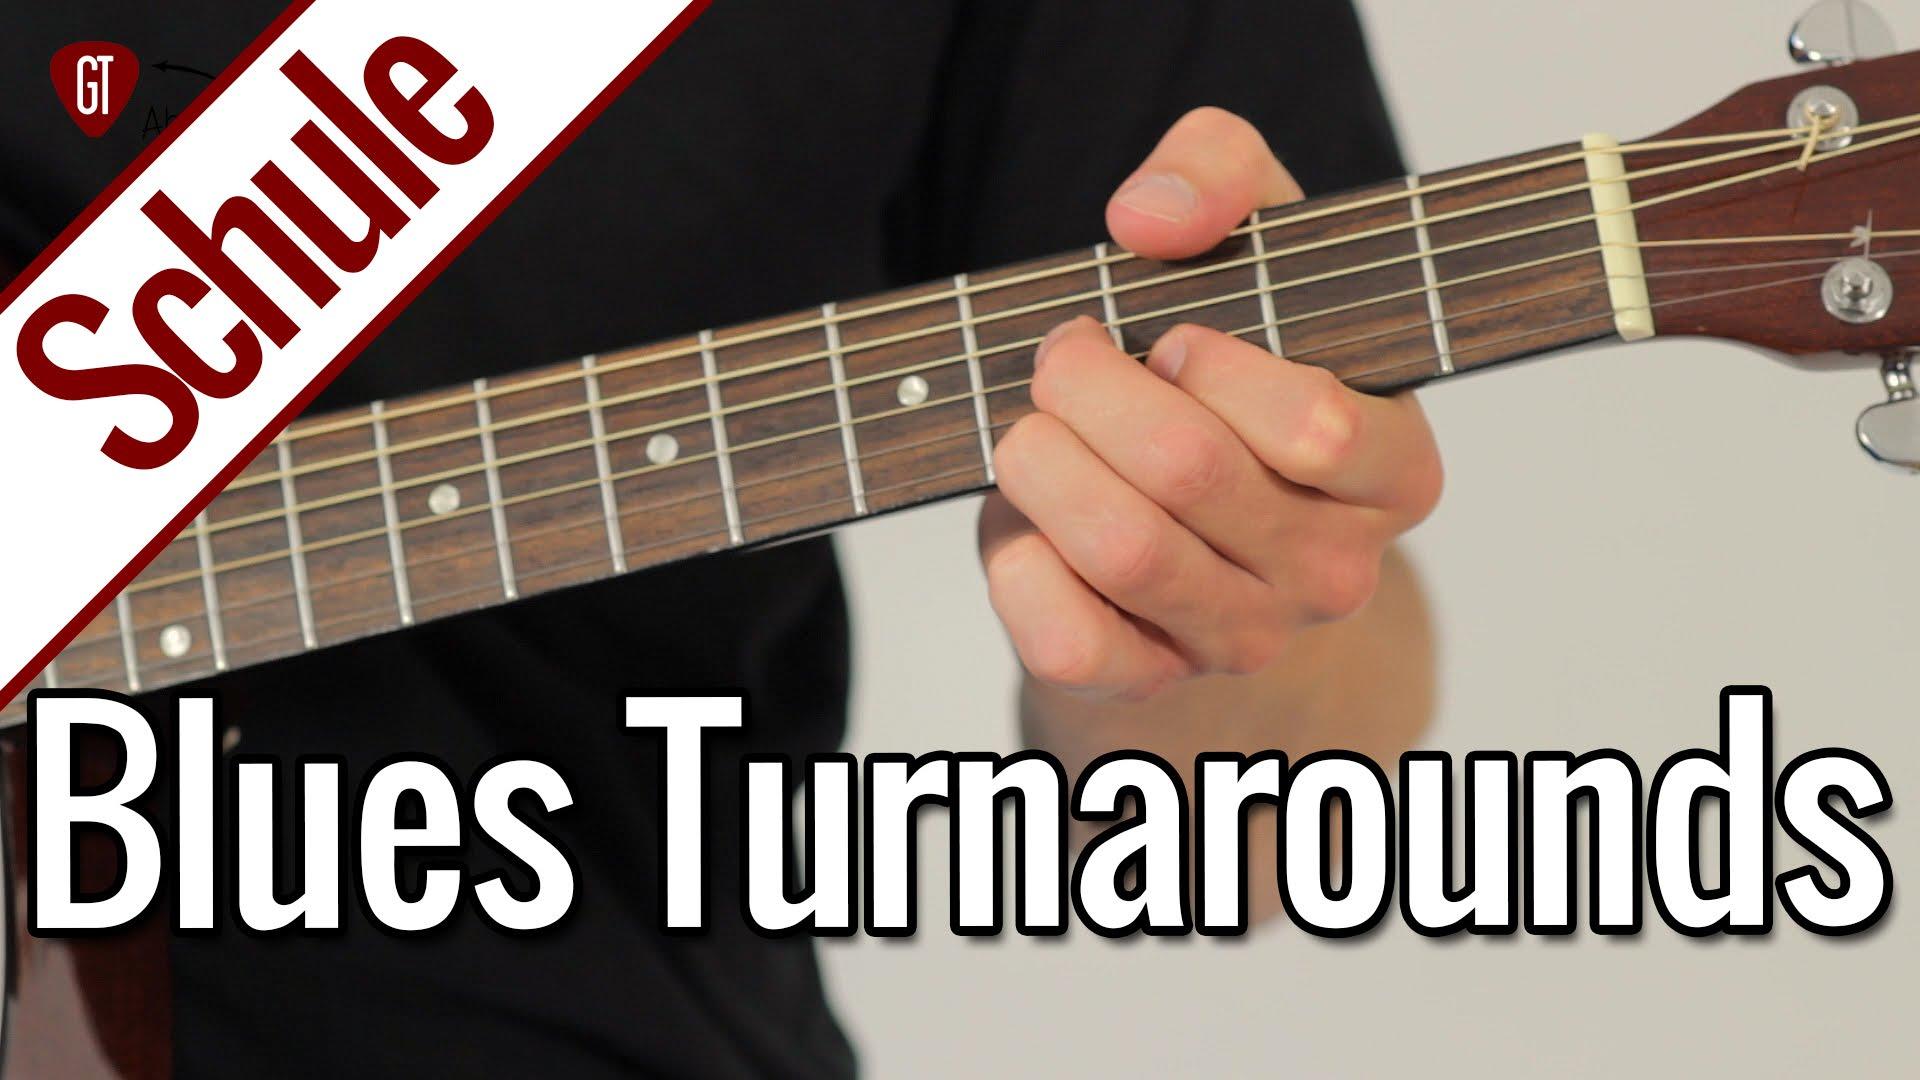 Meine 3 Blues Turnarounds Favoriten | Gitarrenschule